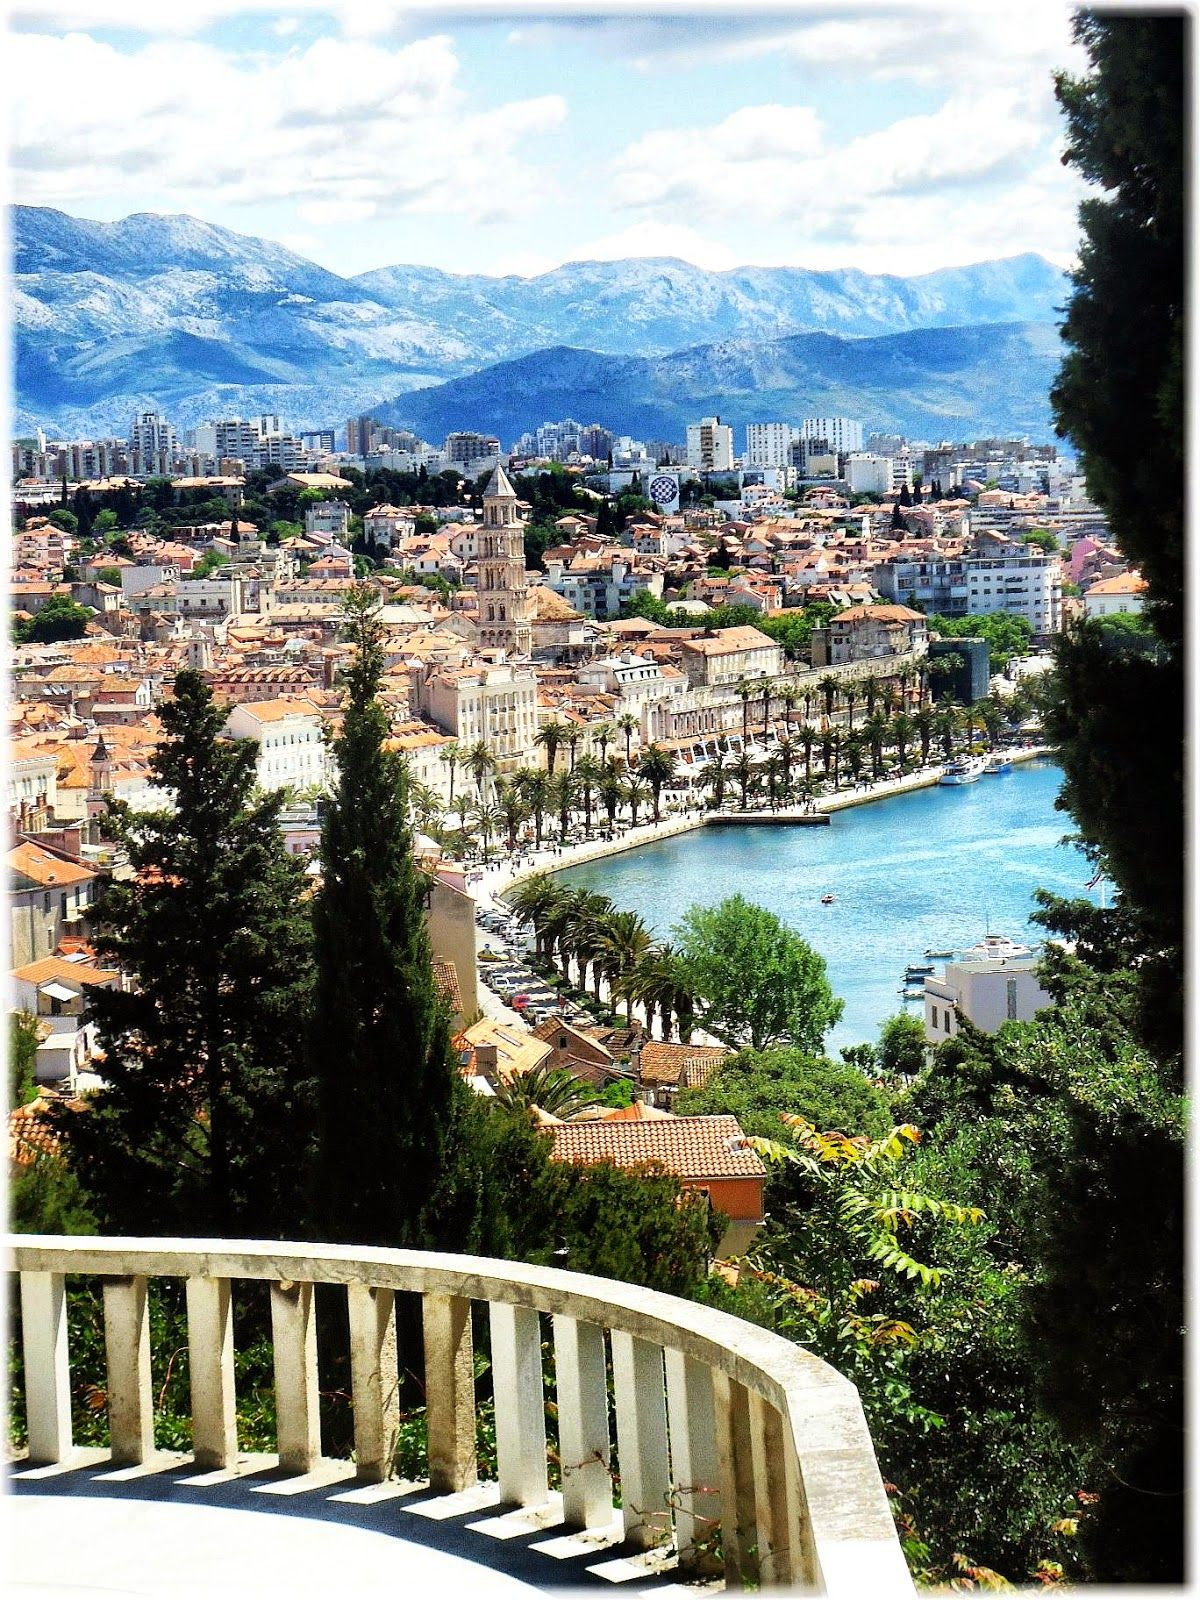 It was so nice traveling through here Split Croatia